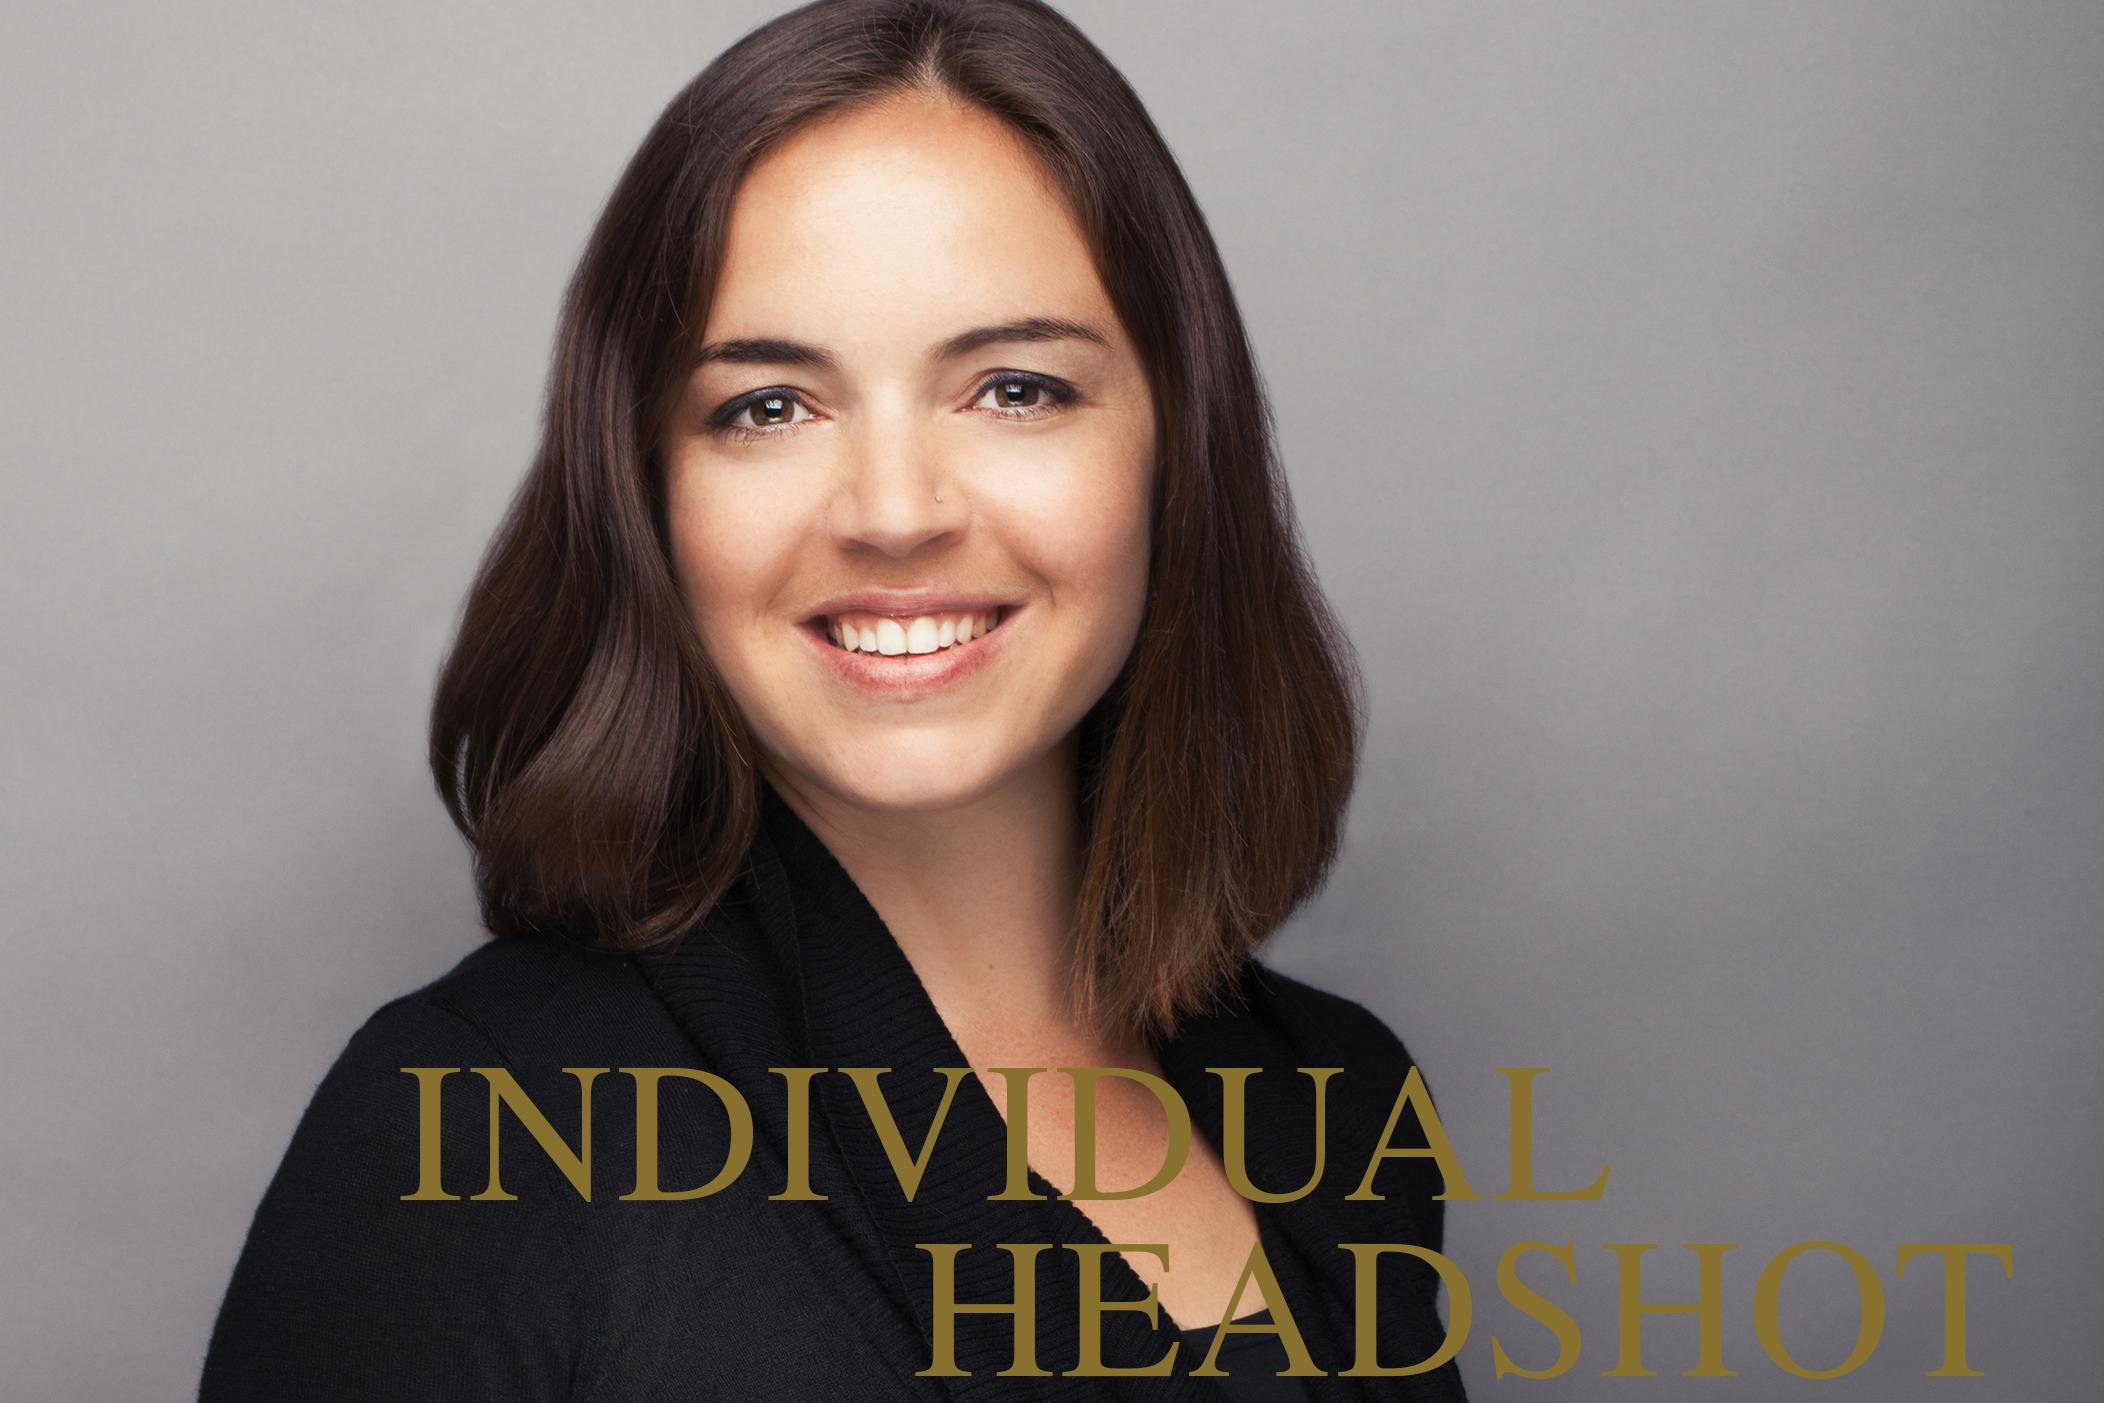 Individual-Headshot-San-Francisco-Bay-Area.jpg